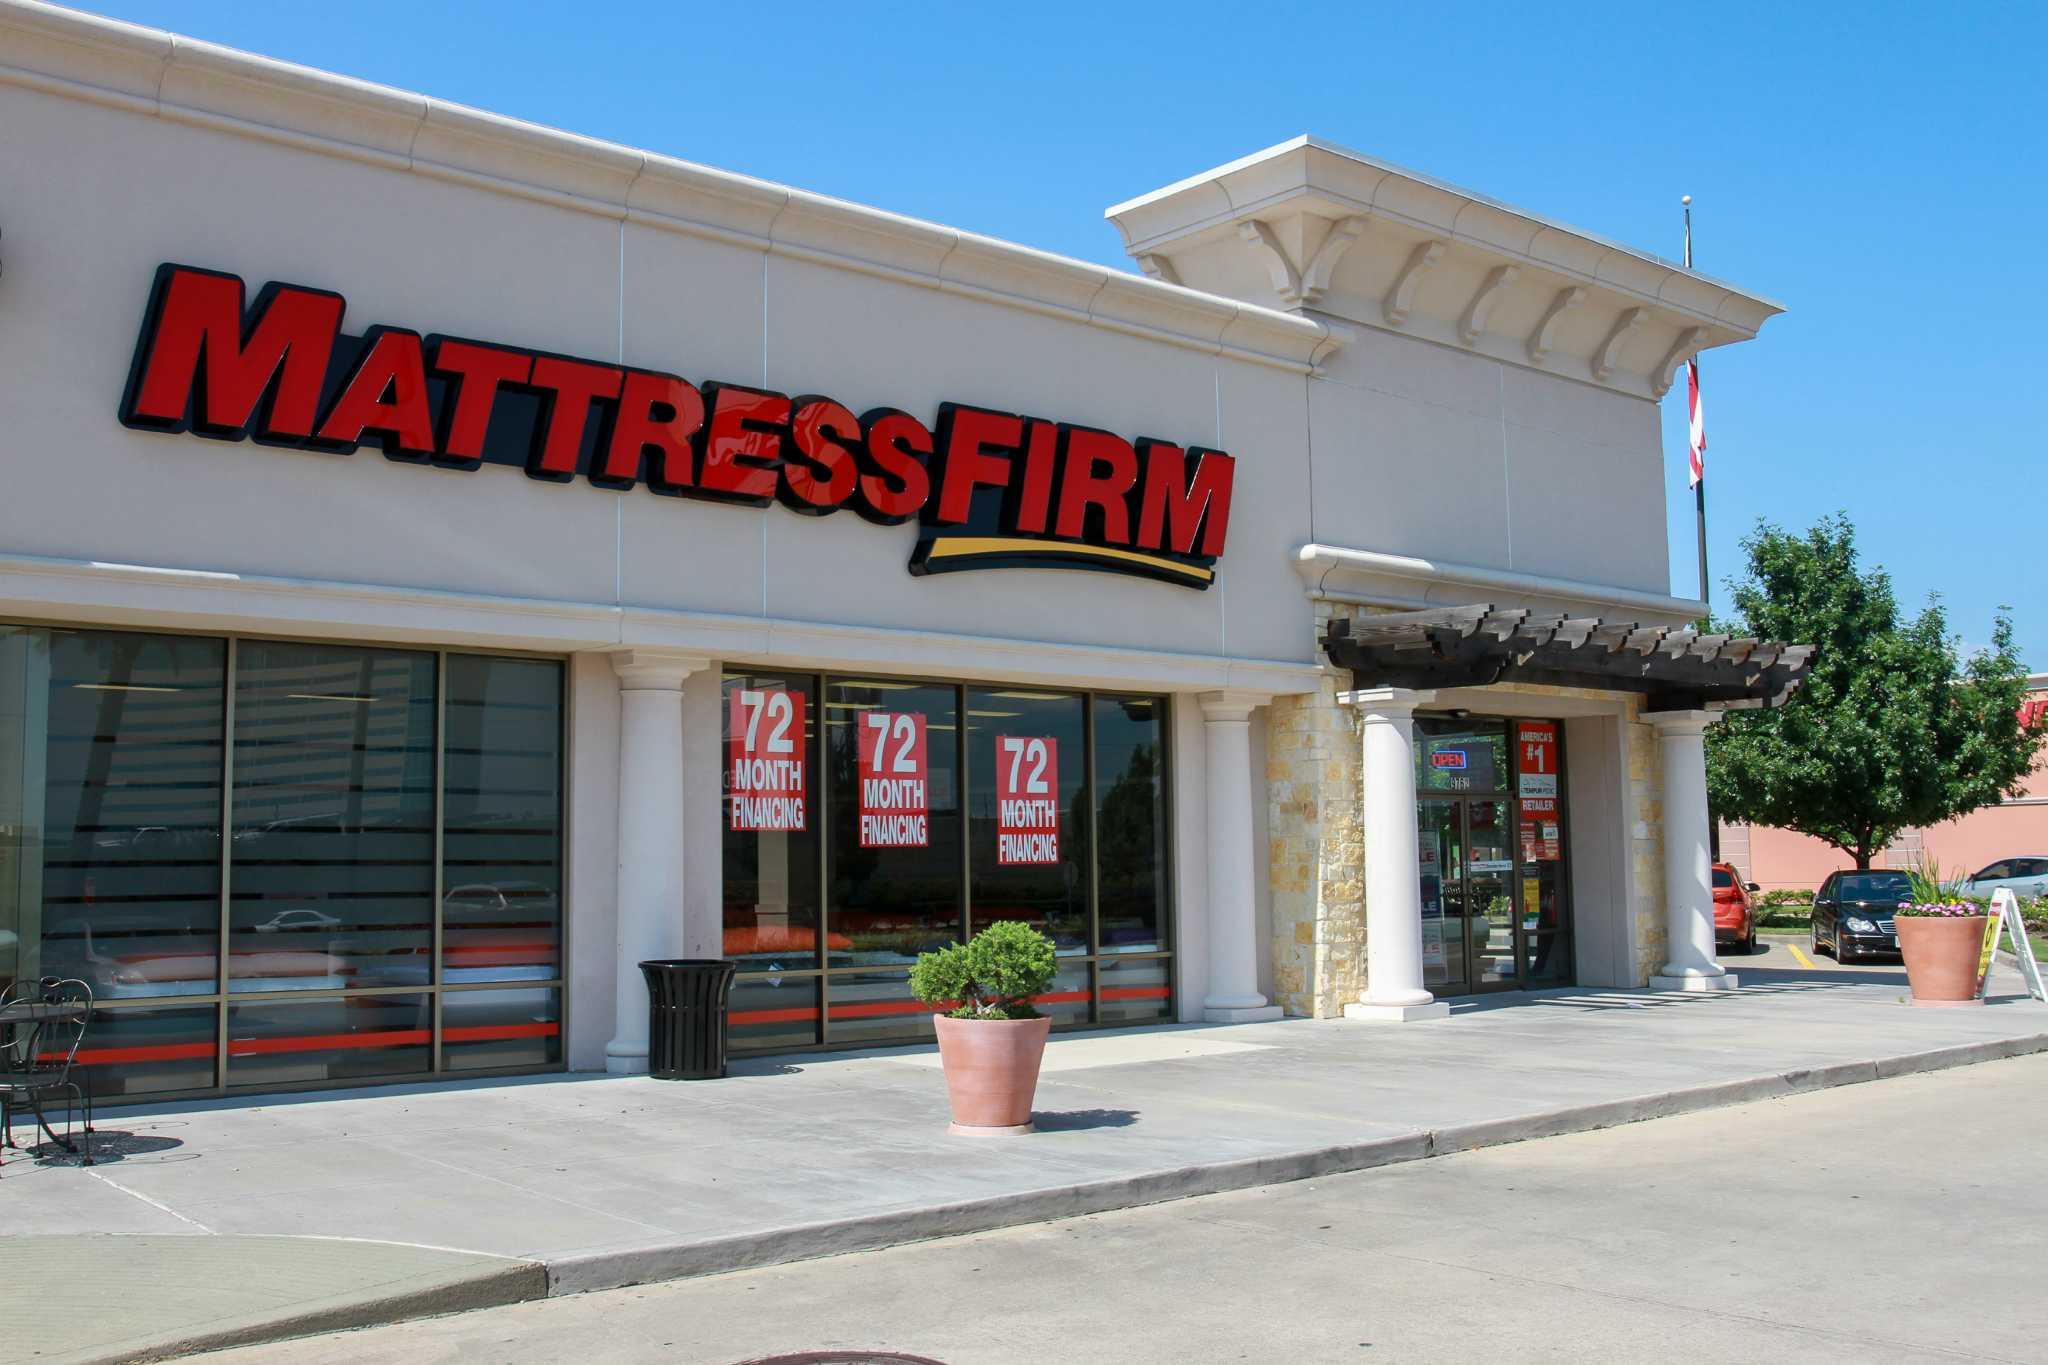 joins the abancommercials commercial tv firm com train sleep mattress advertsiment pin hawaii